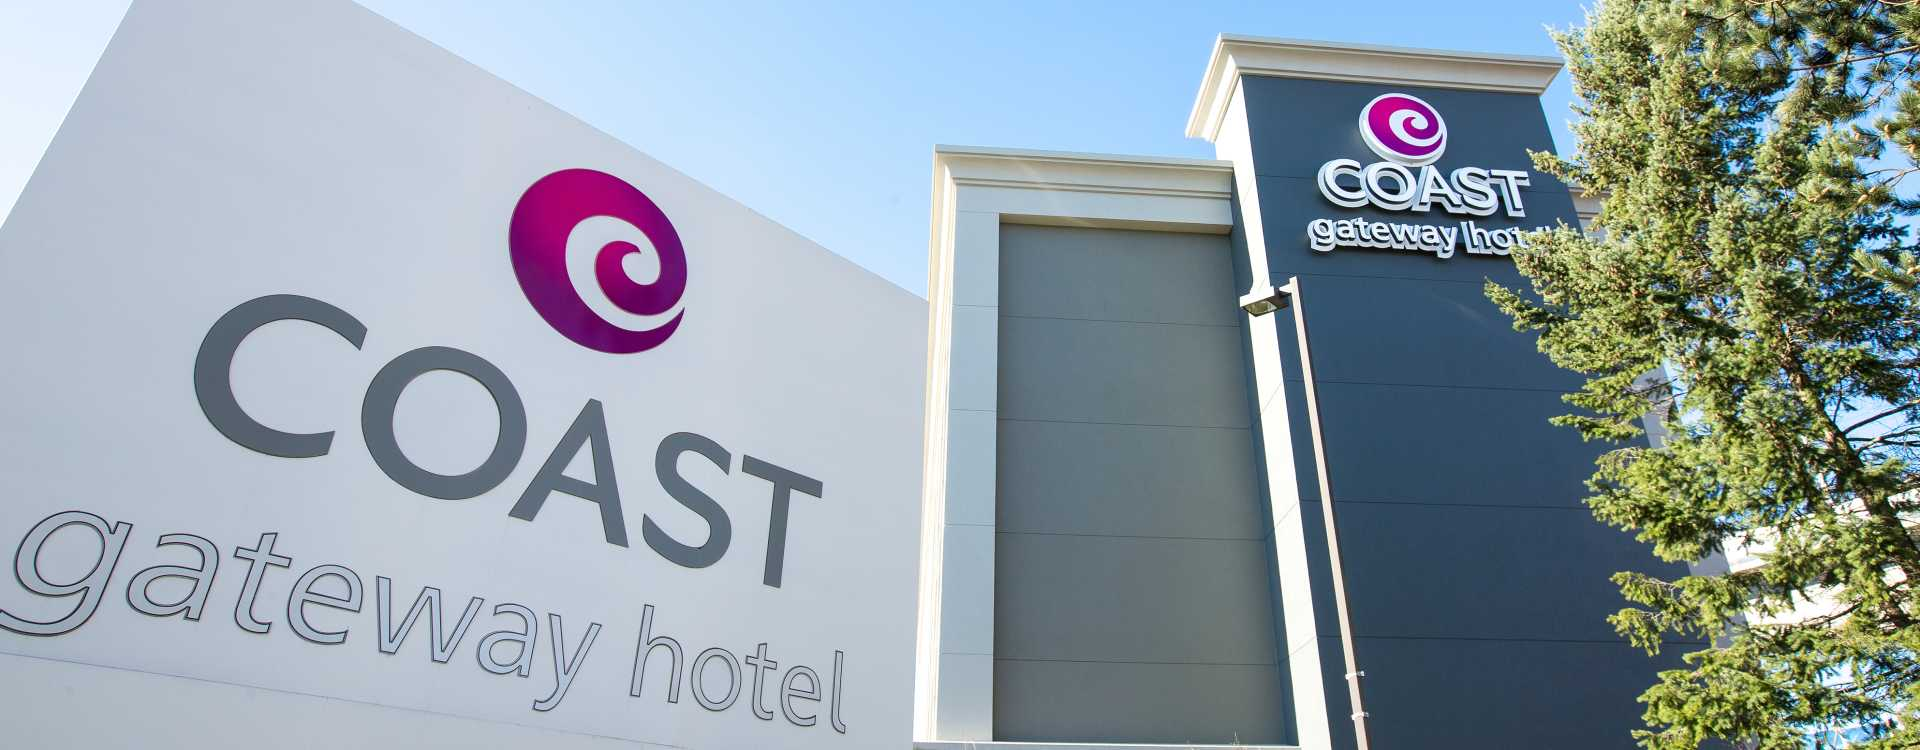 Coast Gateway Hotel exterior